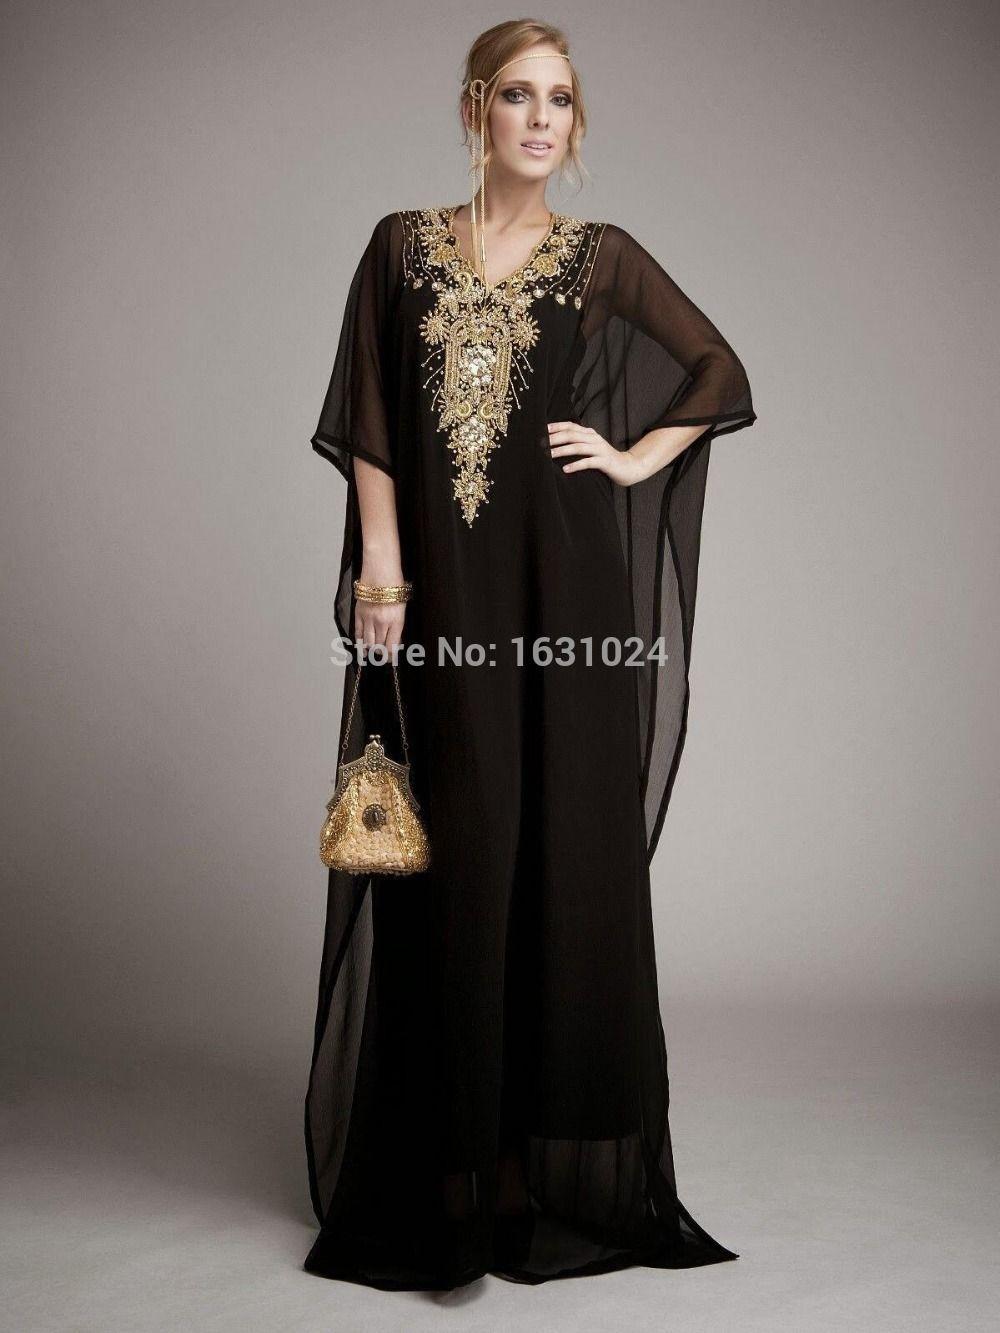 árabe Trendy De Sexy Vestidos Negro Dorado Musulmán Que